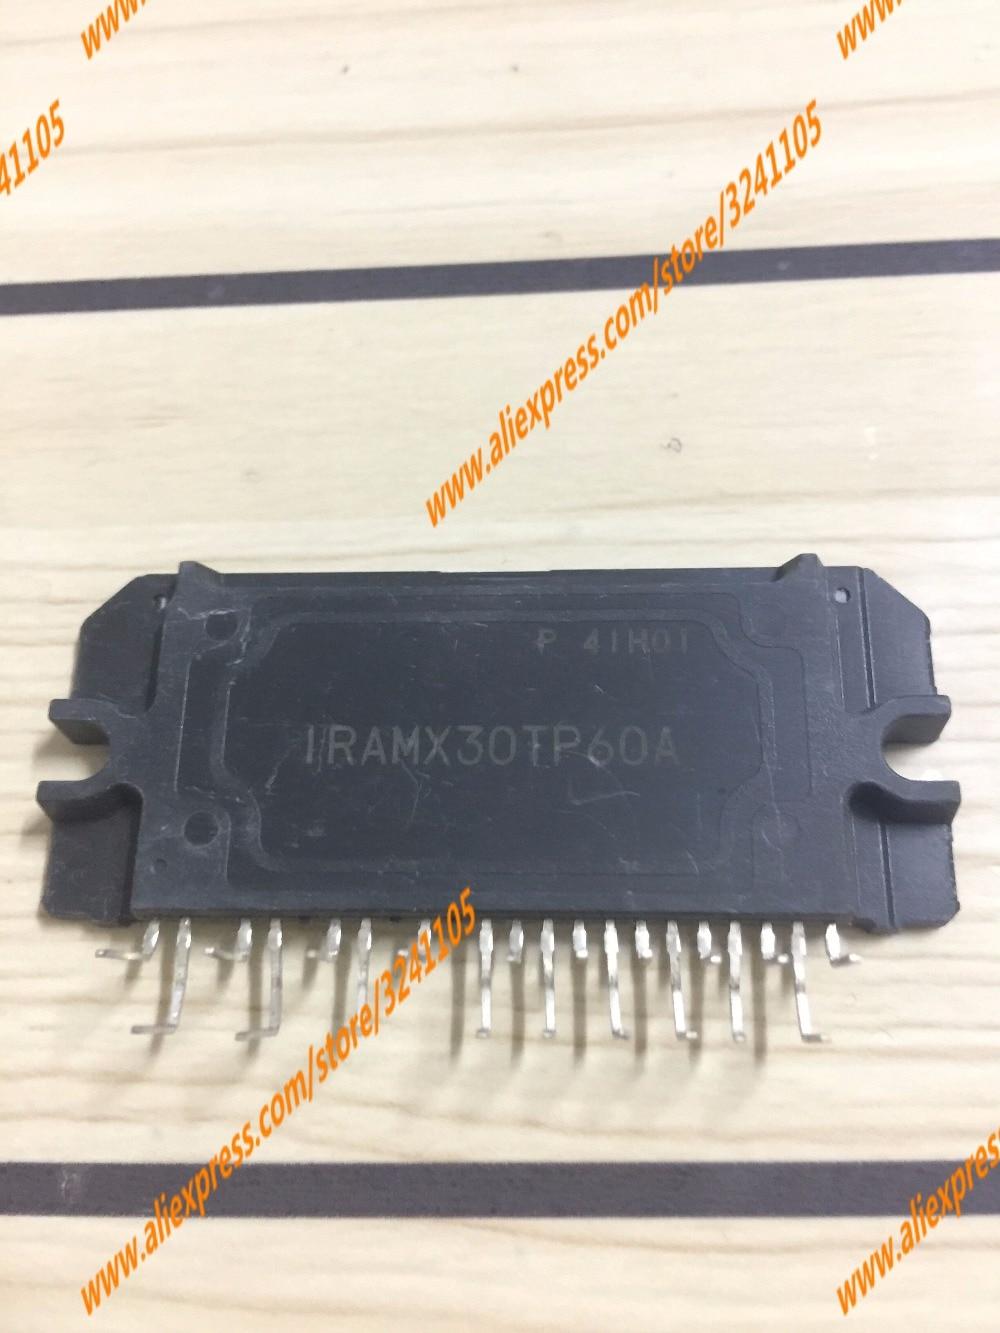 Free Shipping NEW  IRAMX30TP60A  MODULE